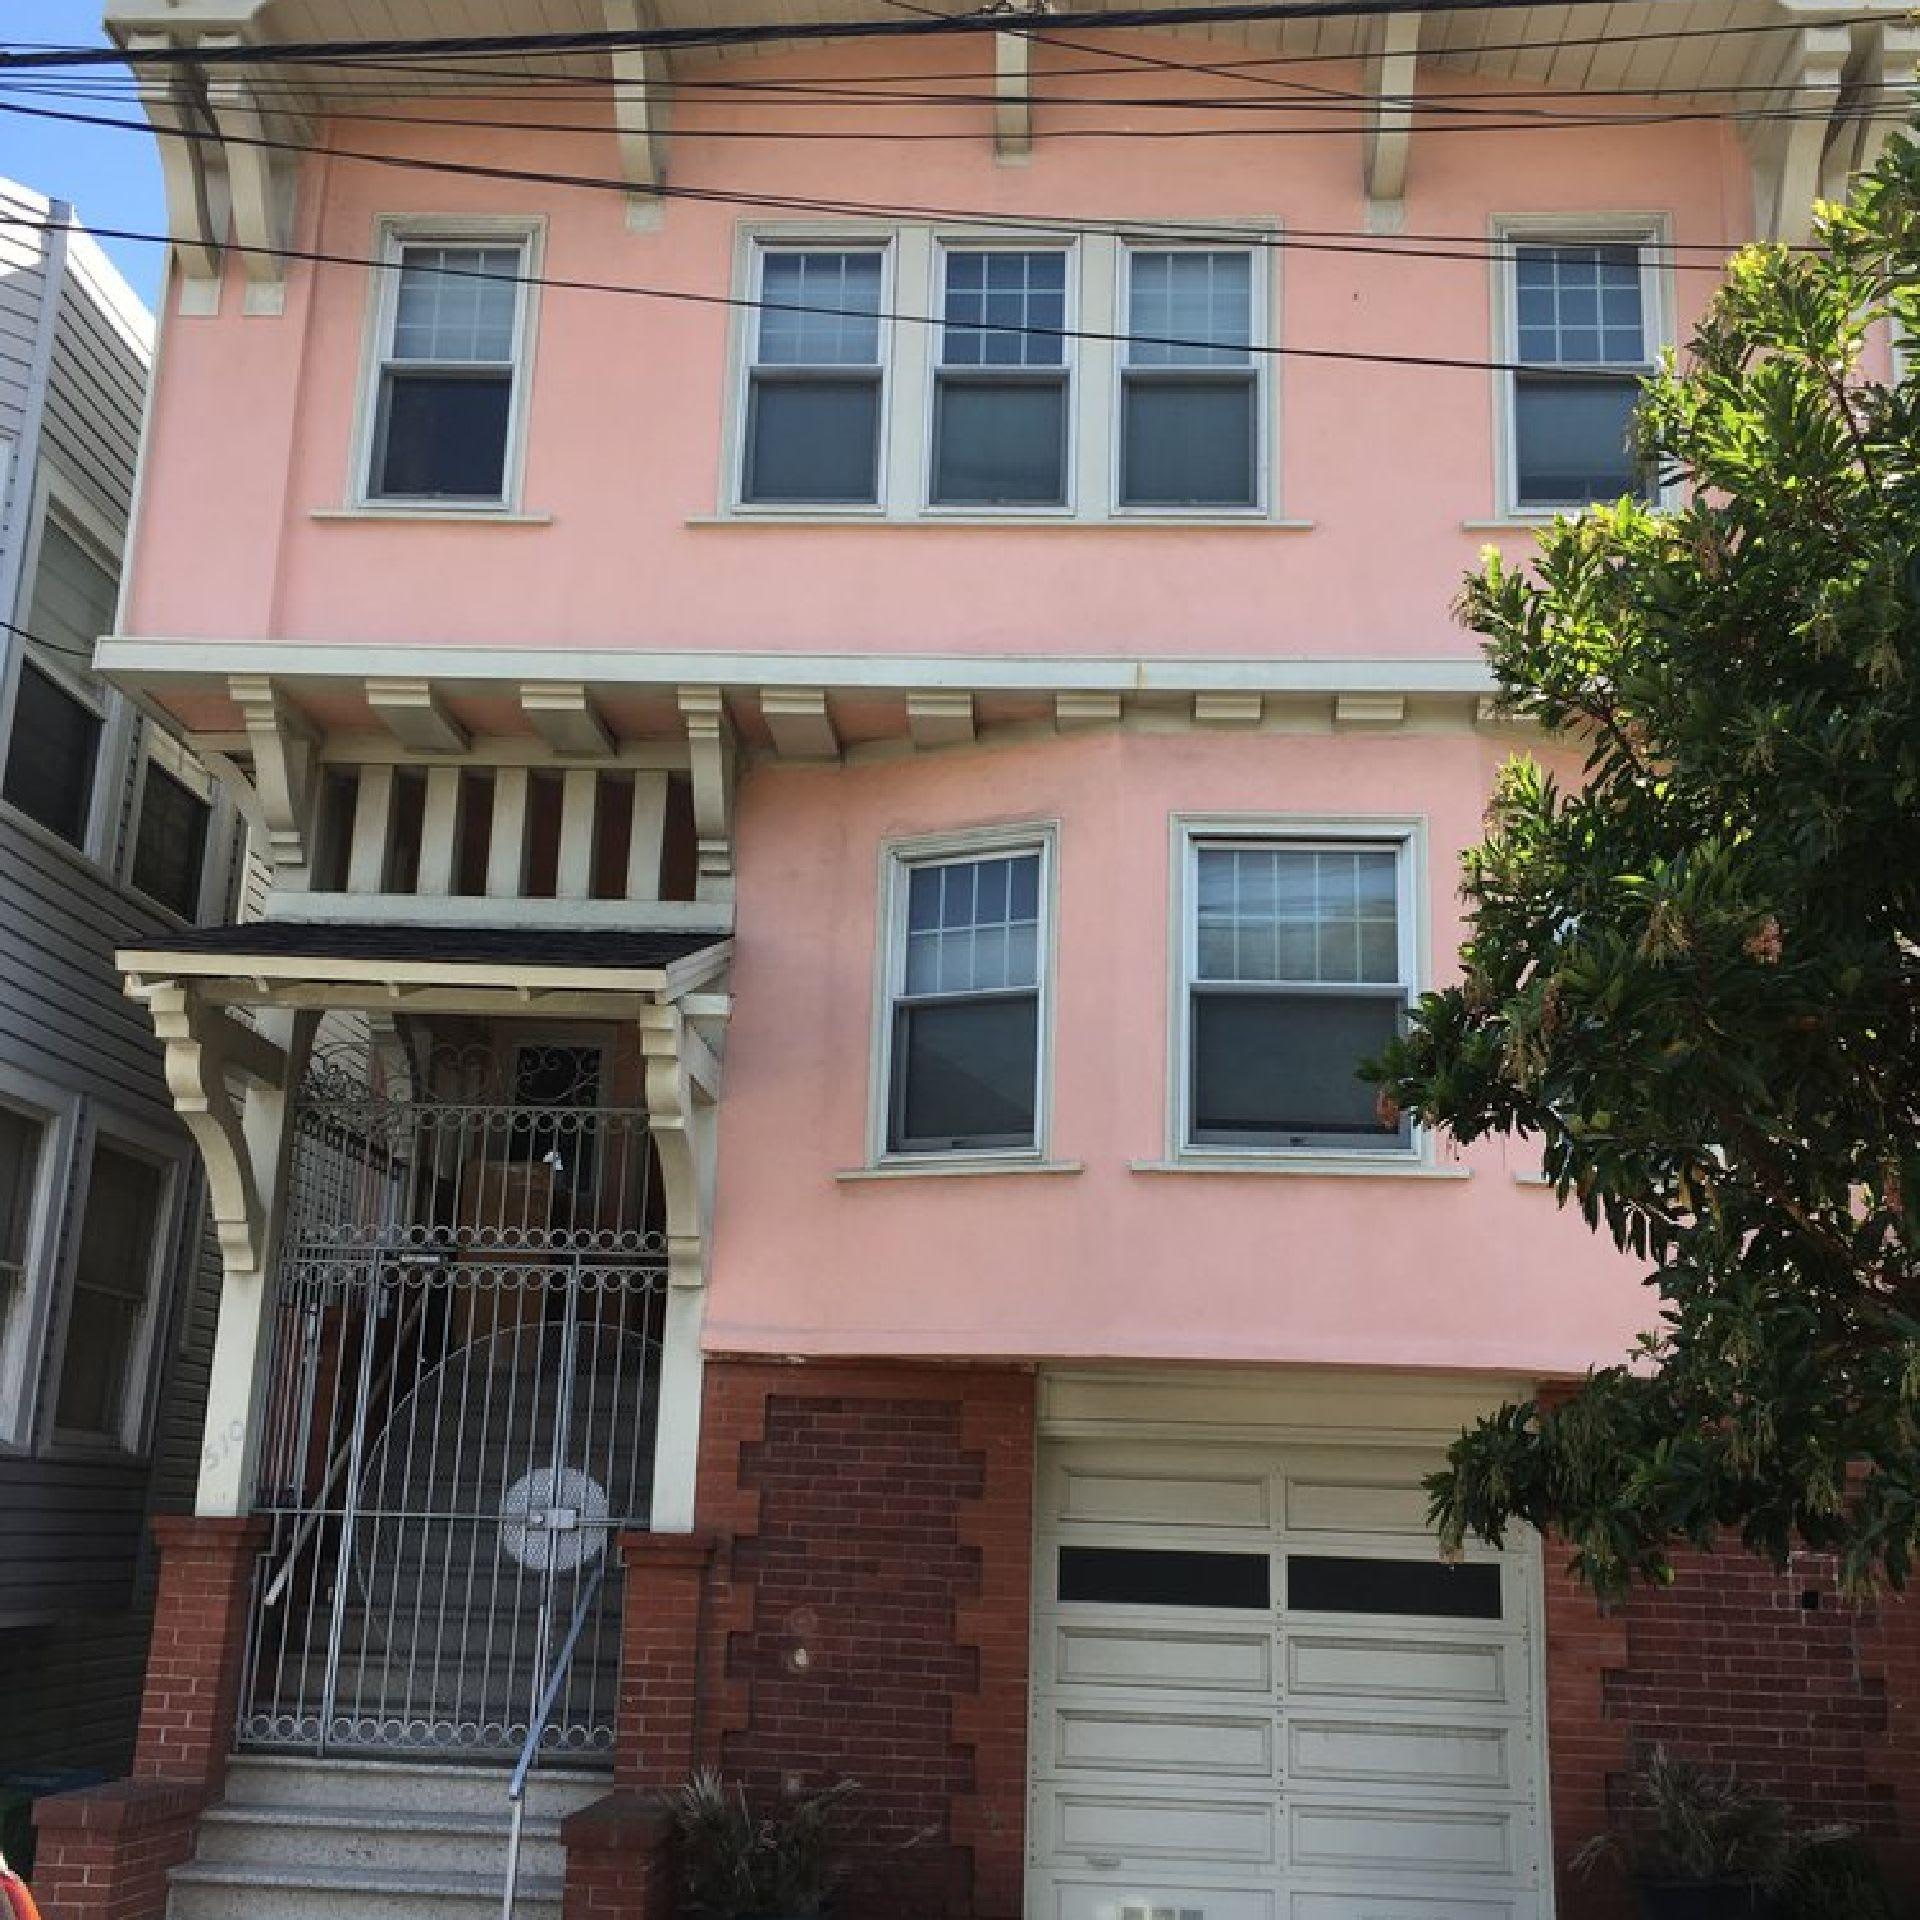 3BR/2.5BA house in Central Richmond